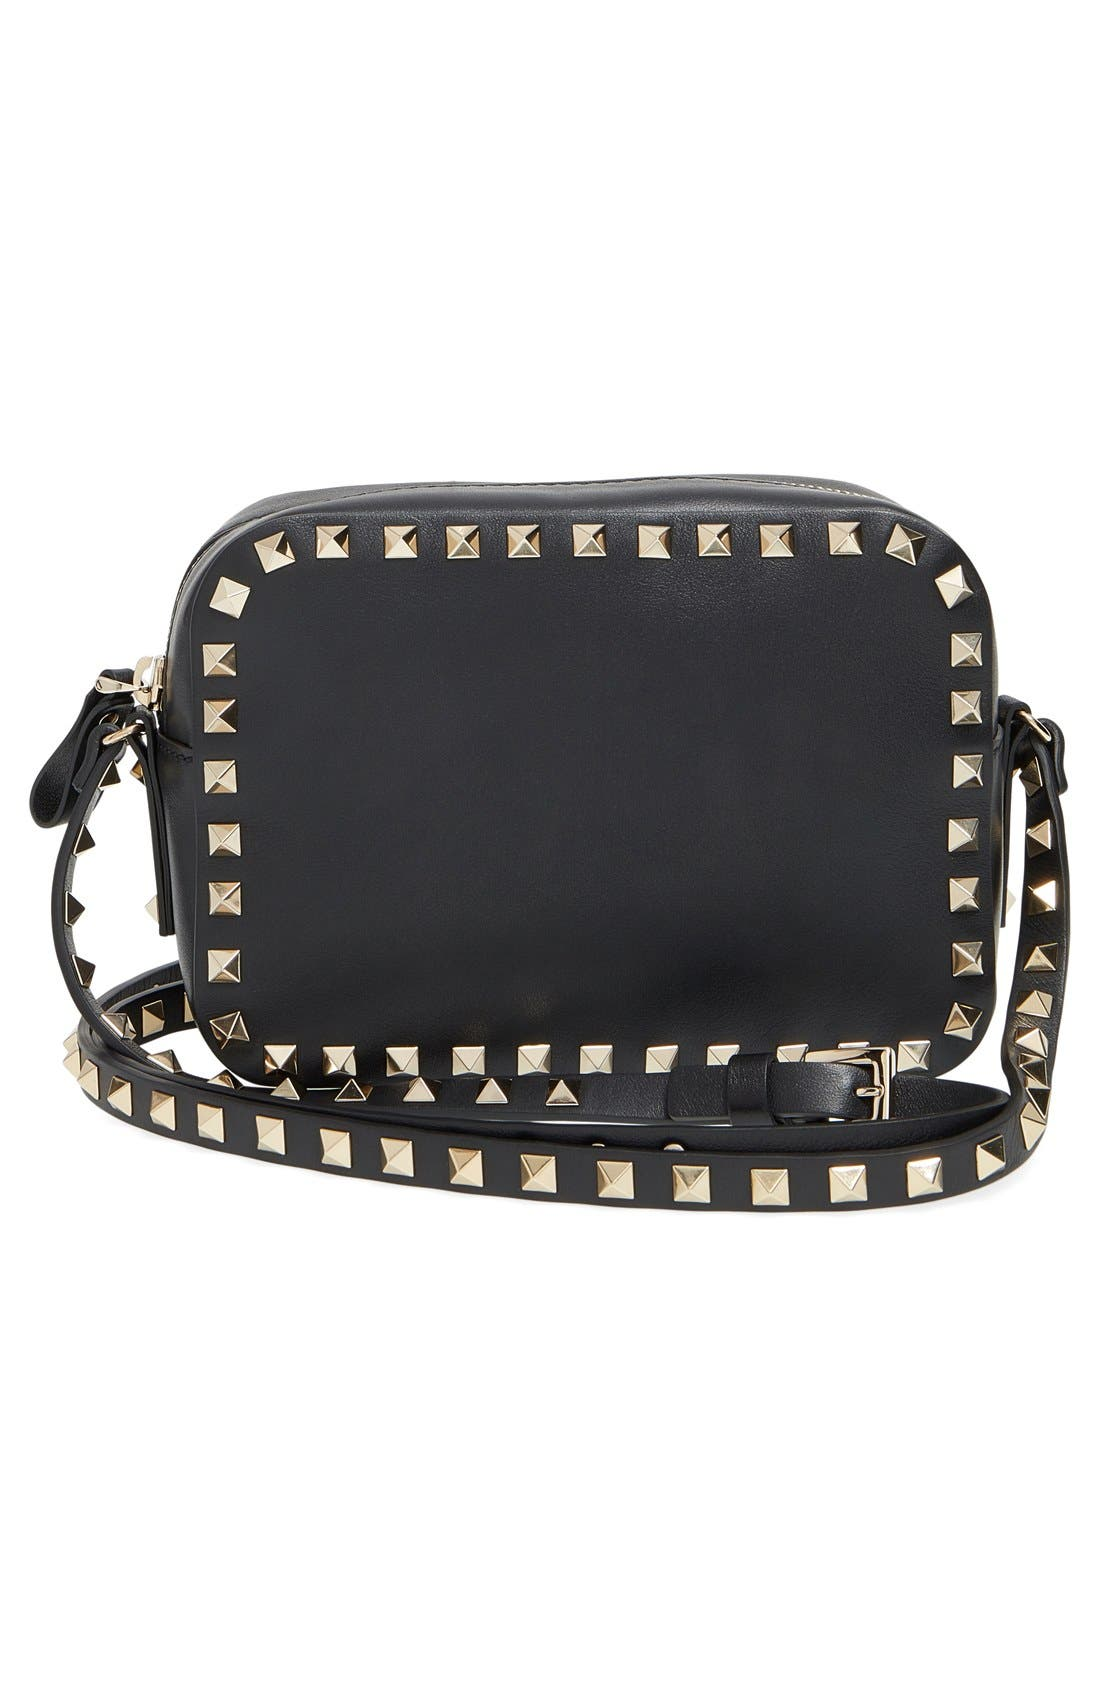 Main Image - Valentino 'Rockstud' Camera Crossbody Bag